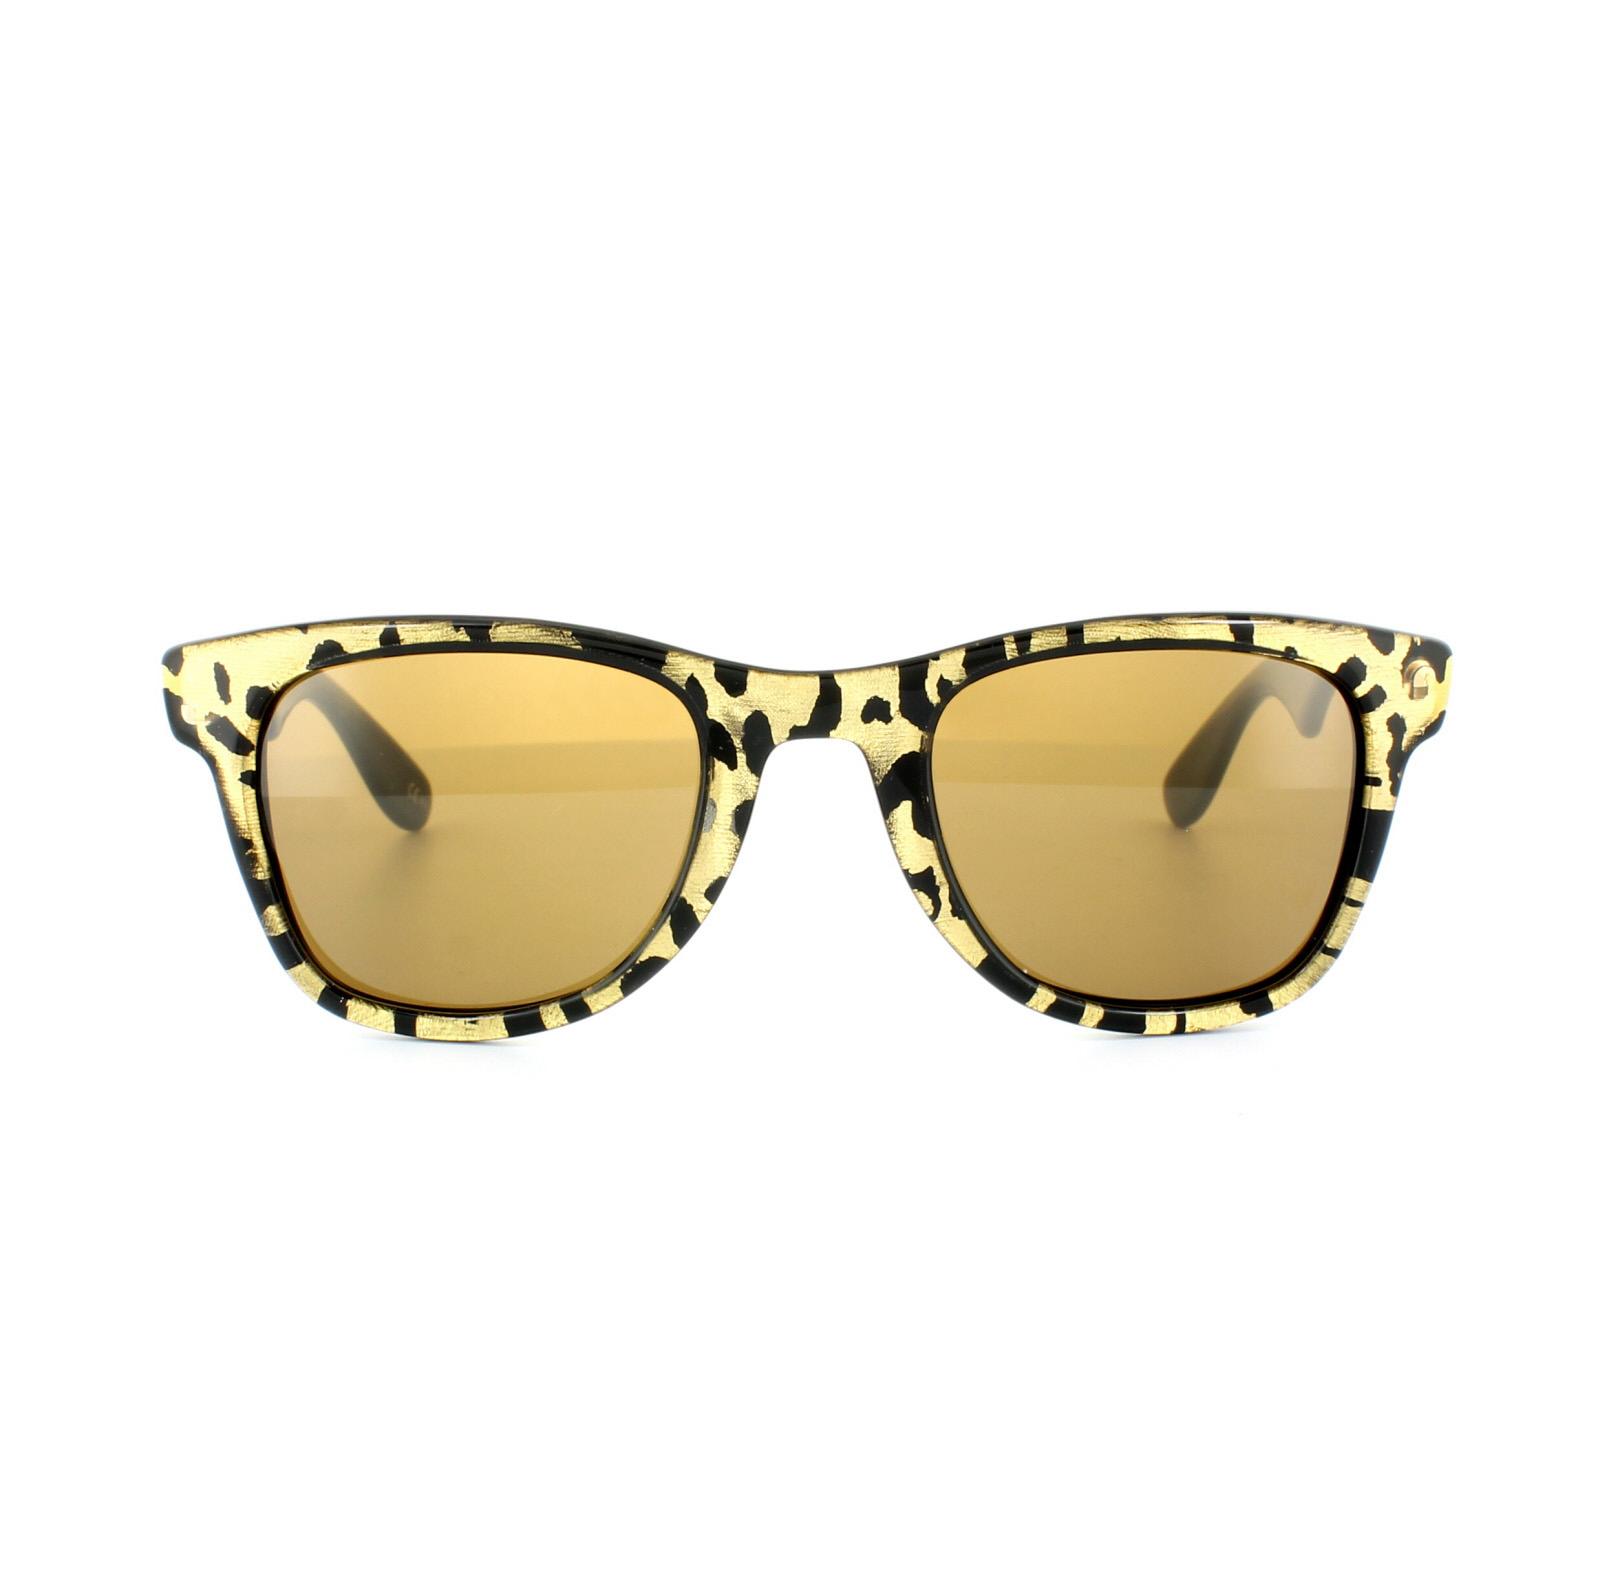 76316fb7338d Sentinel Carrera by Jimmy Choo Sunglasses 6000 JC 3TB VB Panther Brown Gold  Mirror